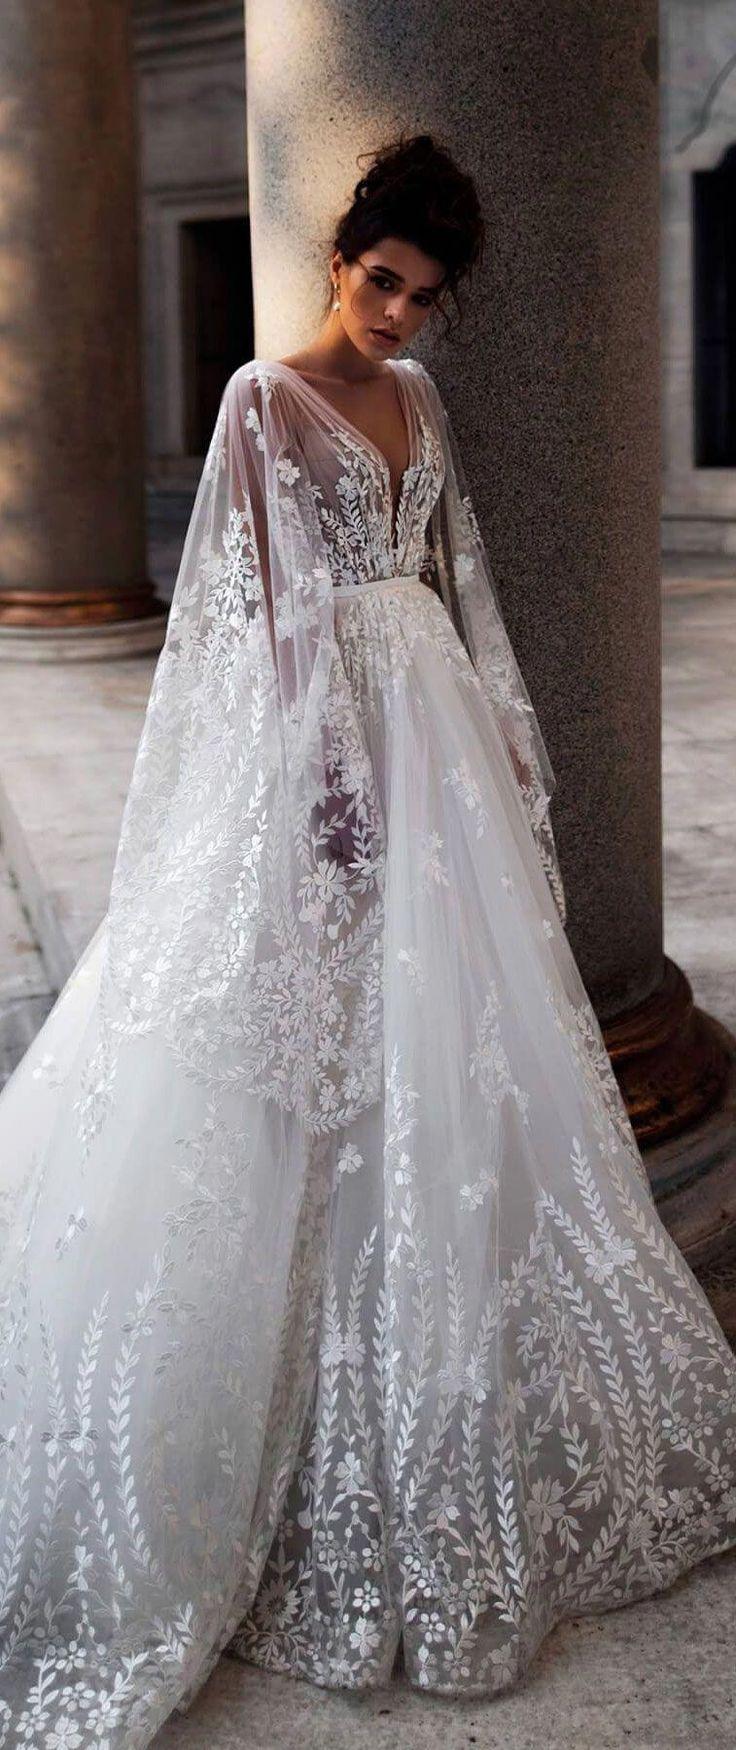 Long Sleeves Deep V Neck Embellishment A Line Wedding Dress Long Train Wedding Deep Dress Long Train Wedding Dress Long Wedding Dresses Bridal Dresses [ 1750 x 736 Pixel ]